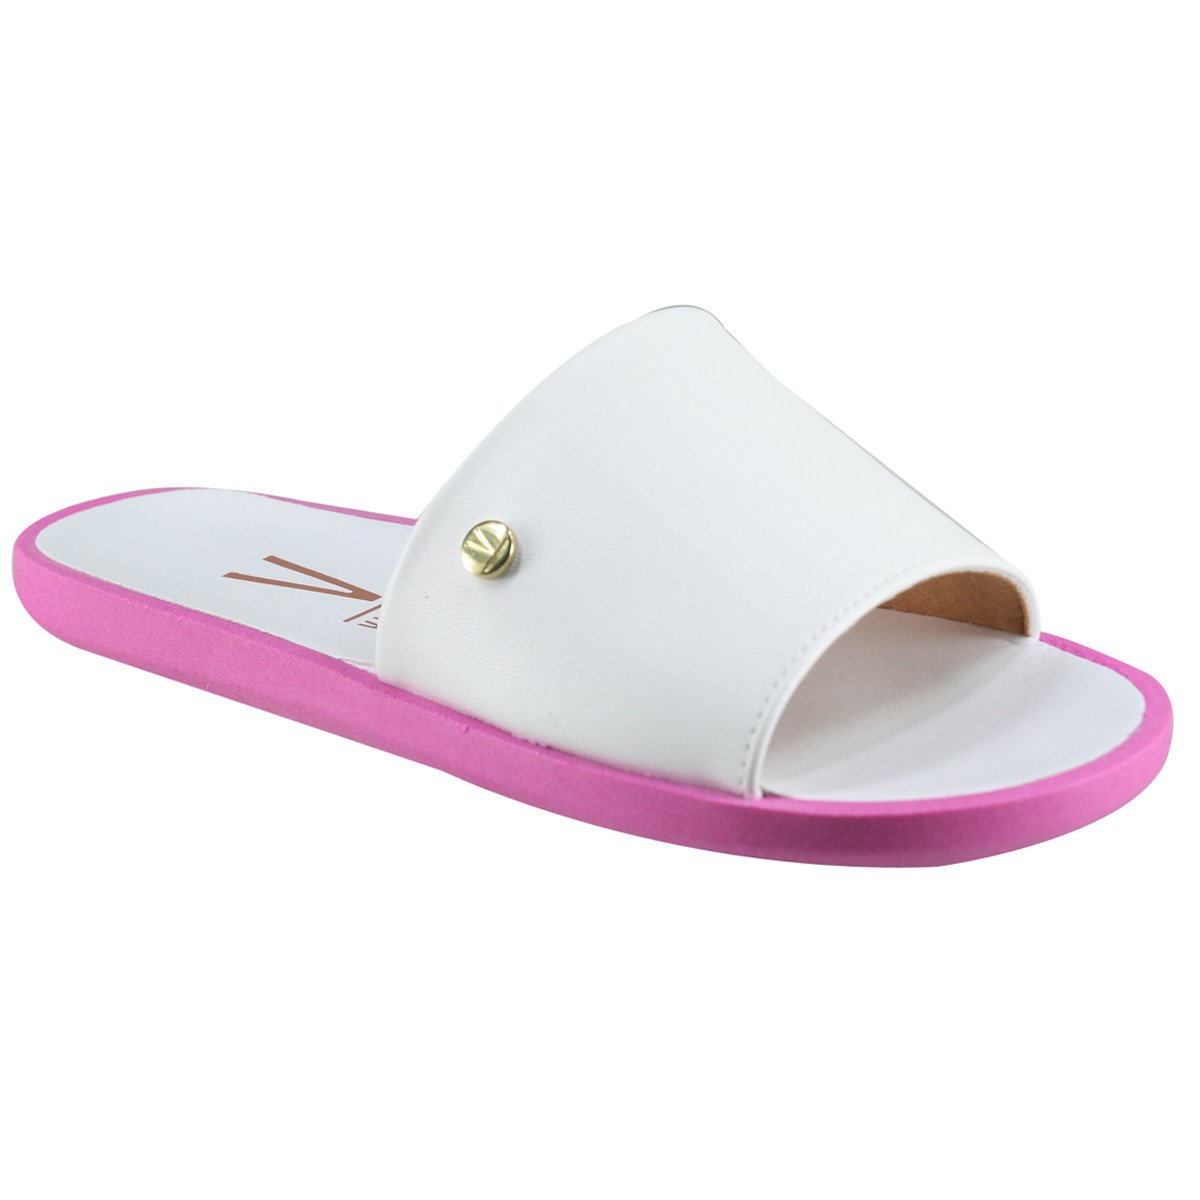 eb9d018eb9 Sandália Vizzano Slide 6363.105 7286 20092 - Branco Pink - Calçados Online  Sandálias